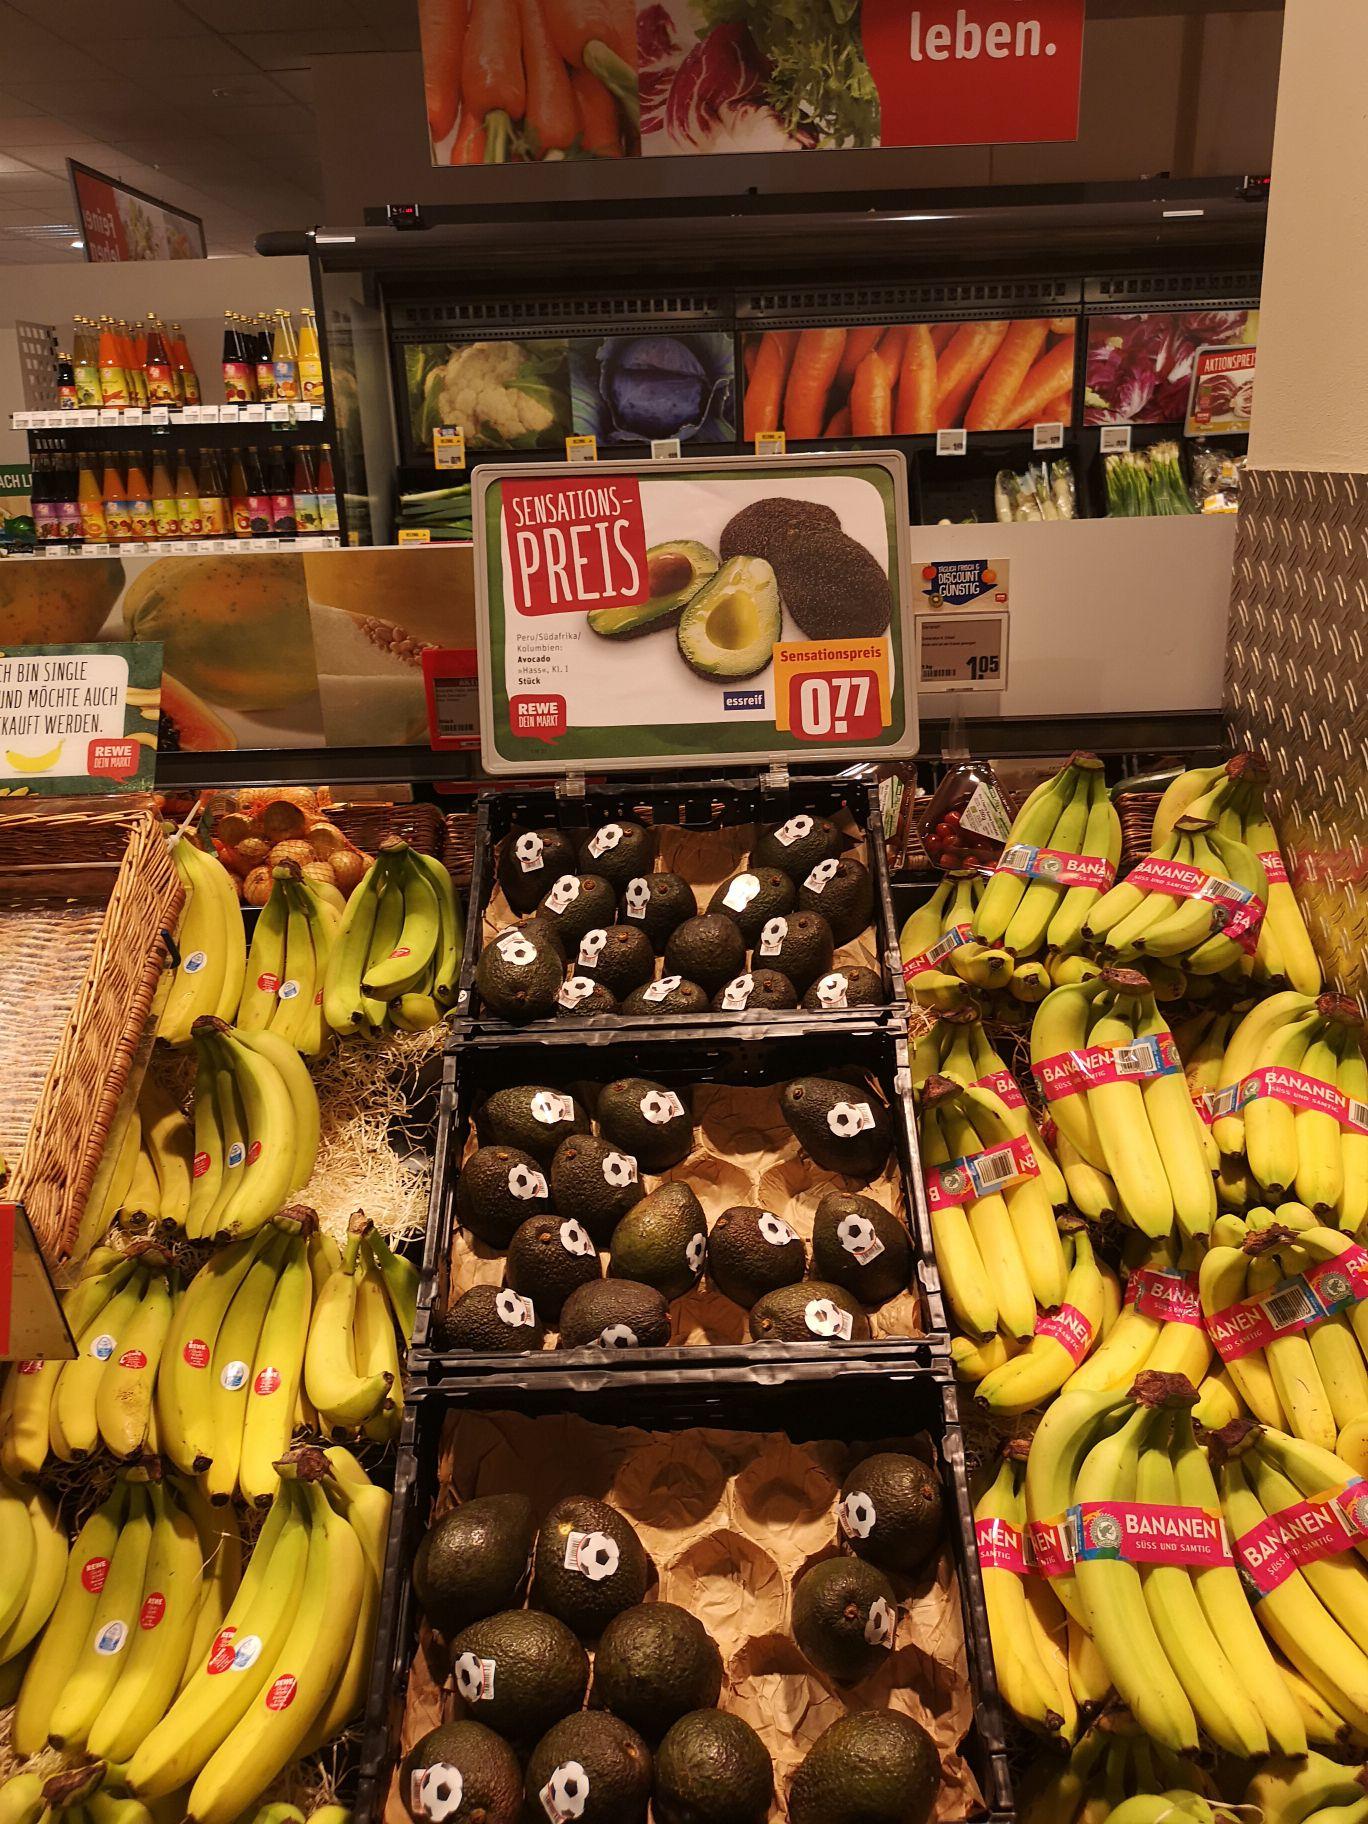 [Lokal Münster REWE] Avocados für 0,77€